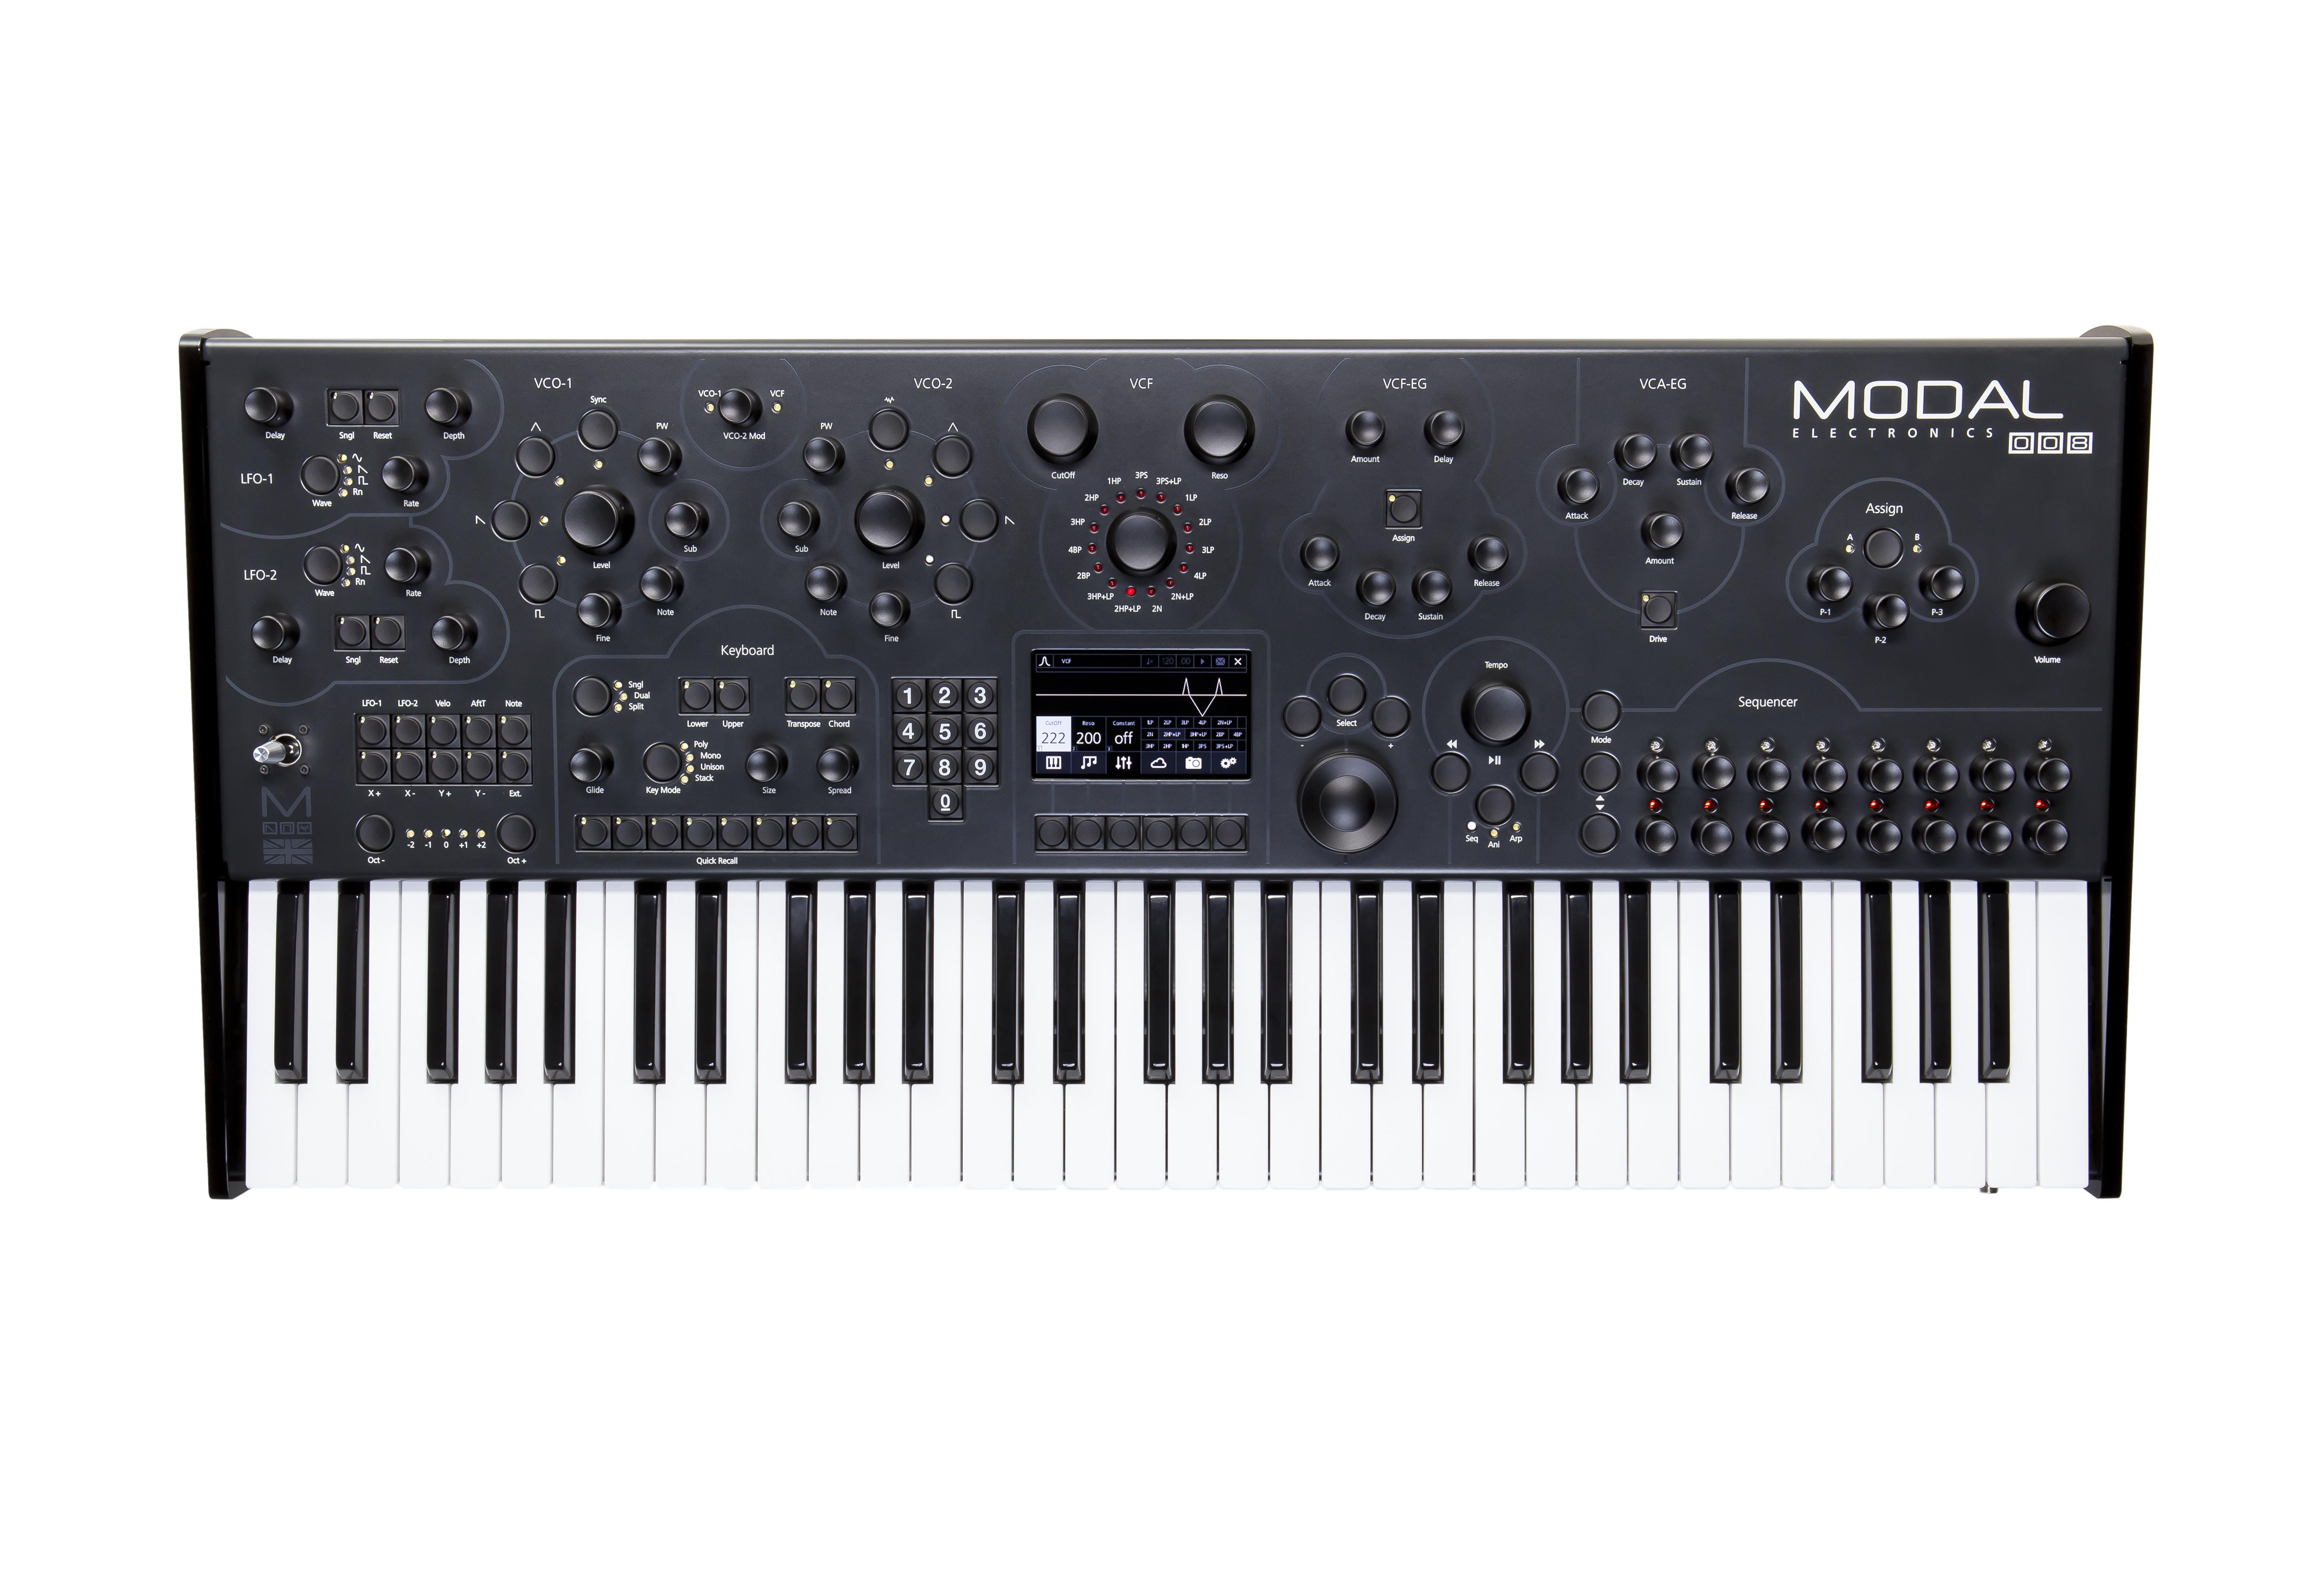 https://medias.audiofanzine.com/images/normal/modal-electronics-008-2859355.jpg